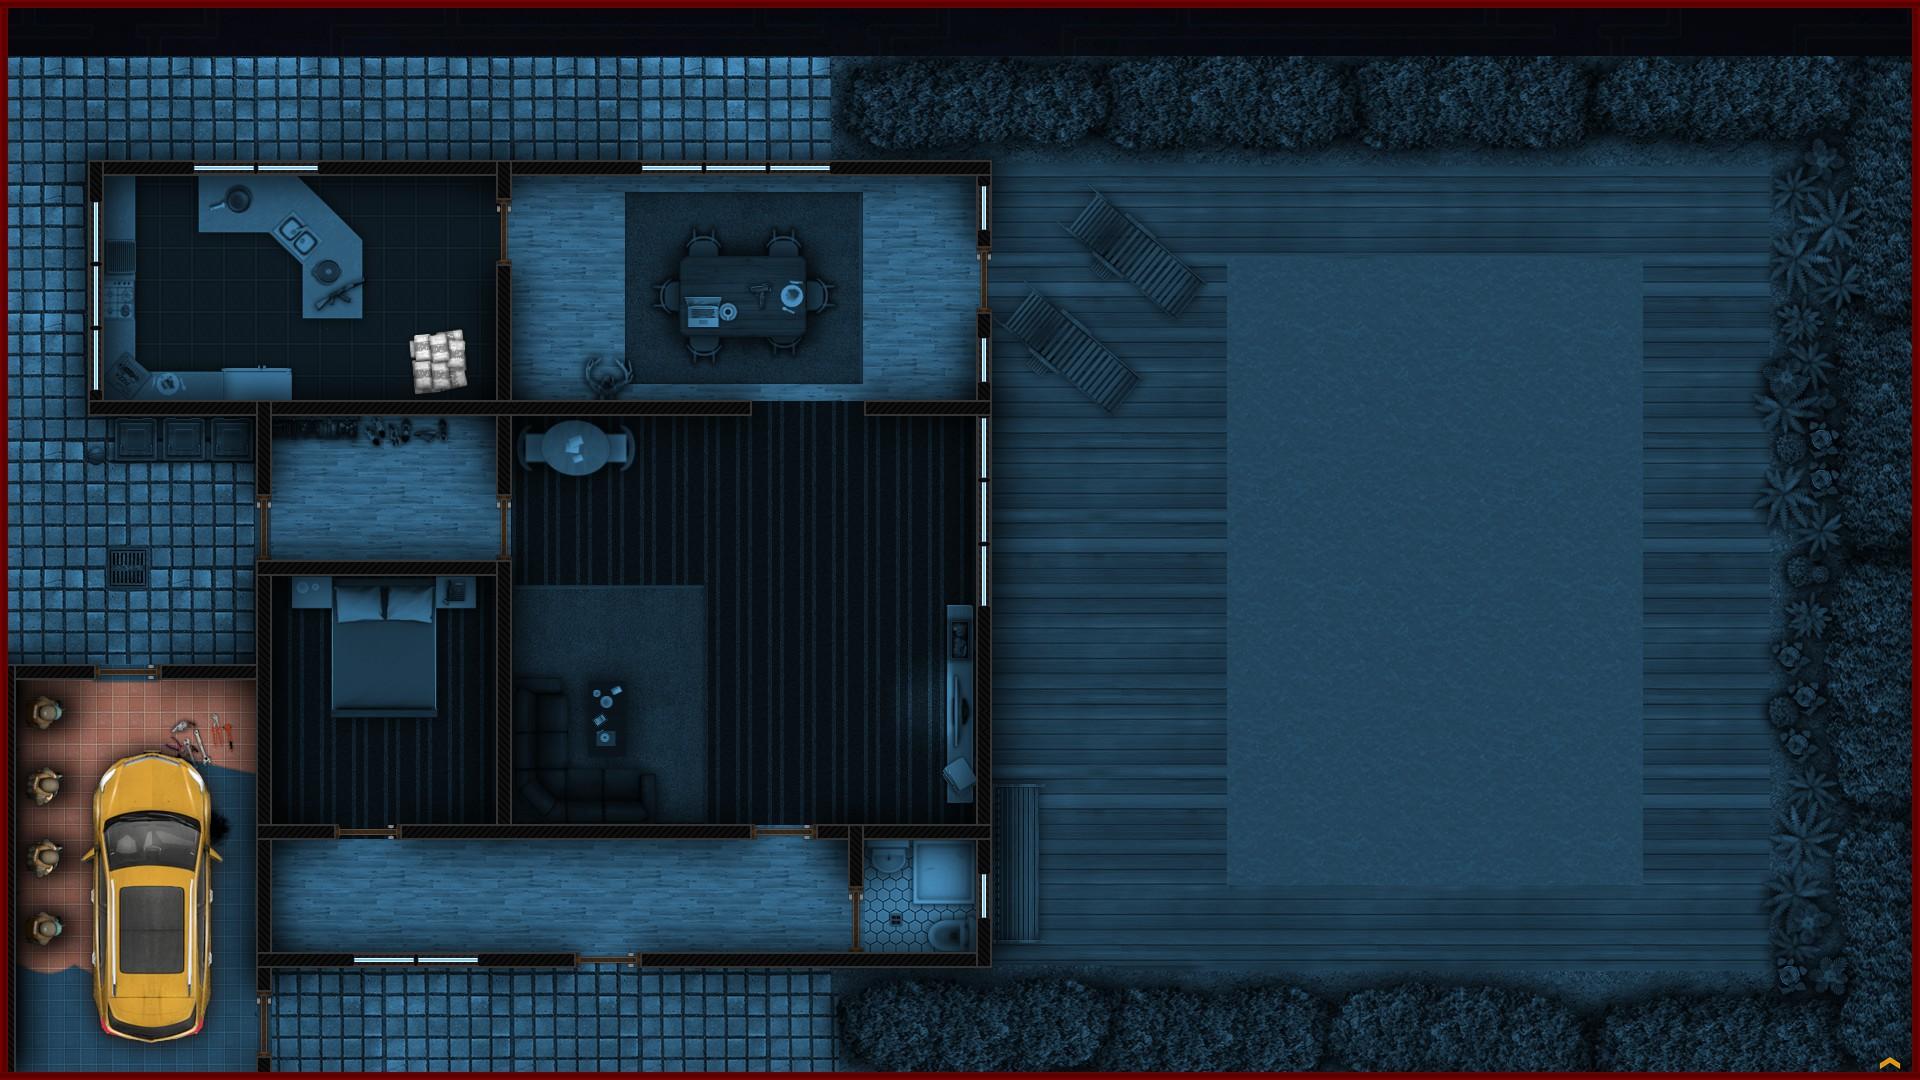 sc 1 st  Steam Community & Steam Workshop :: Upside down - Door Kickers Mission